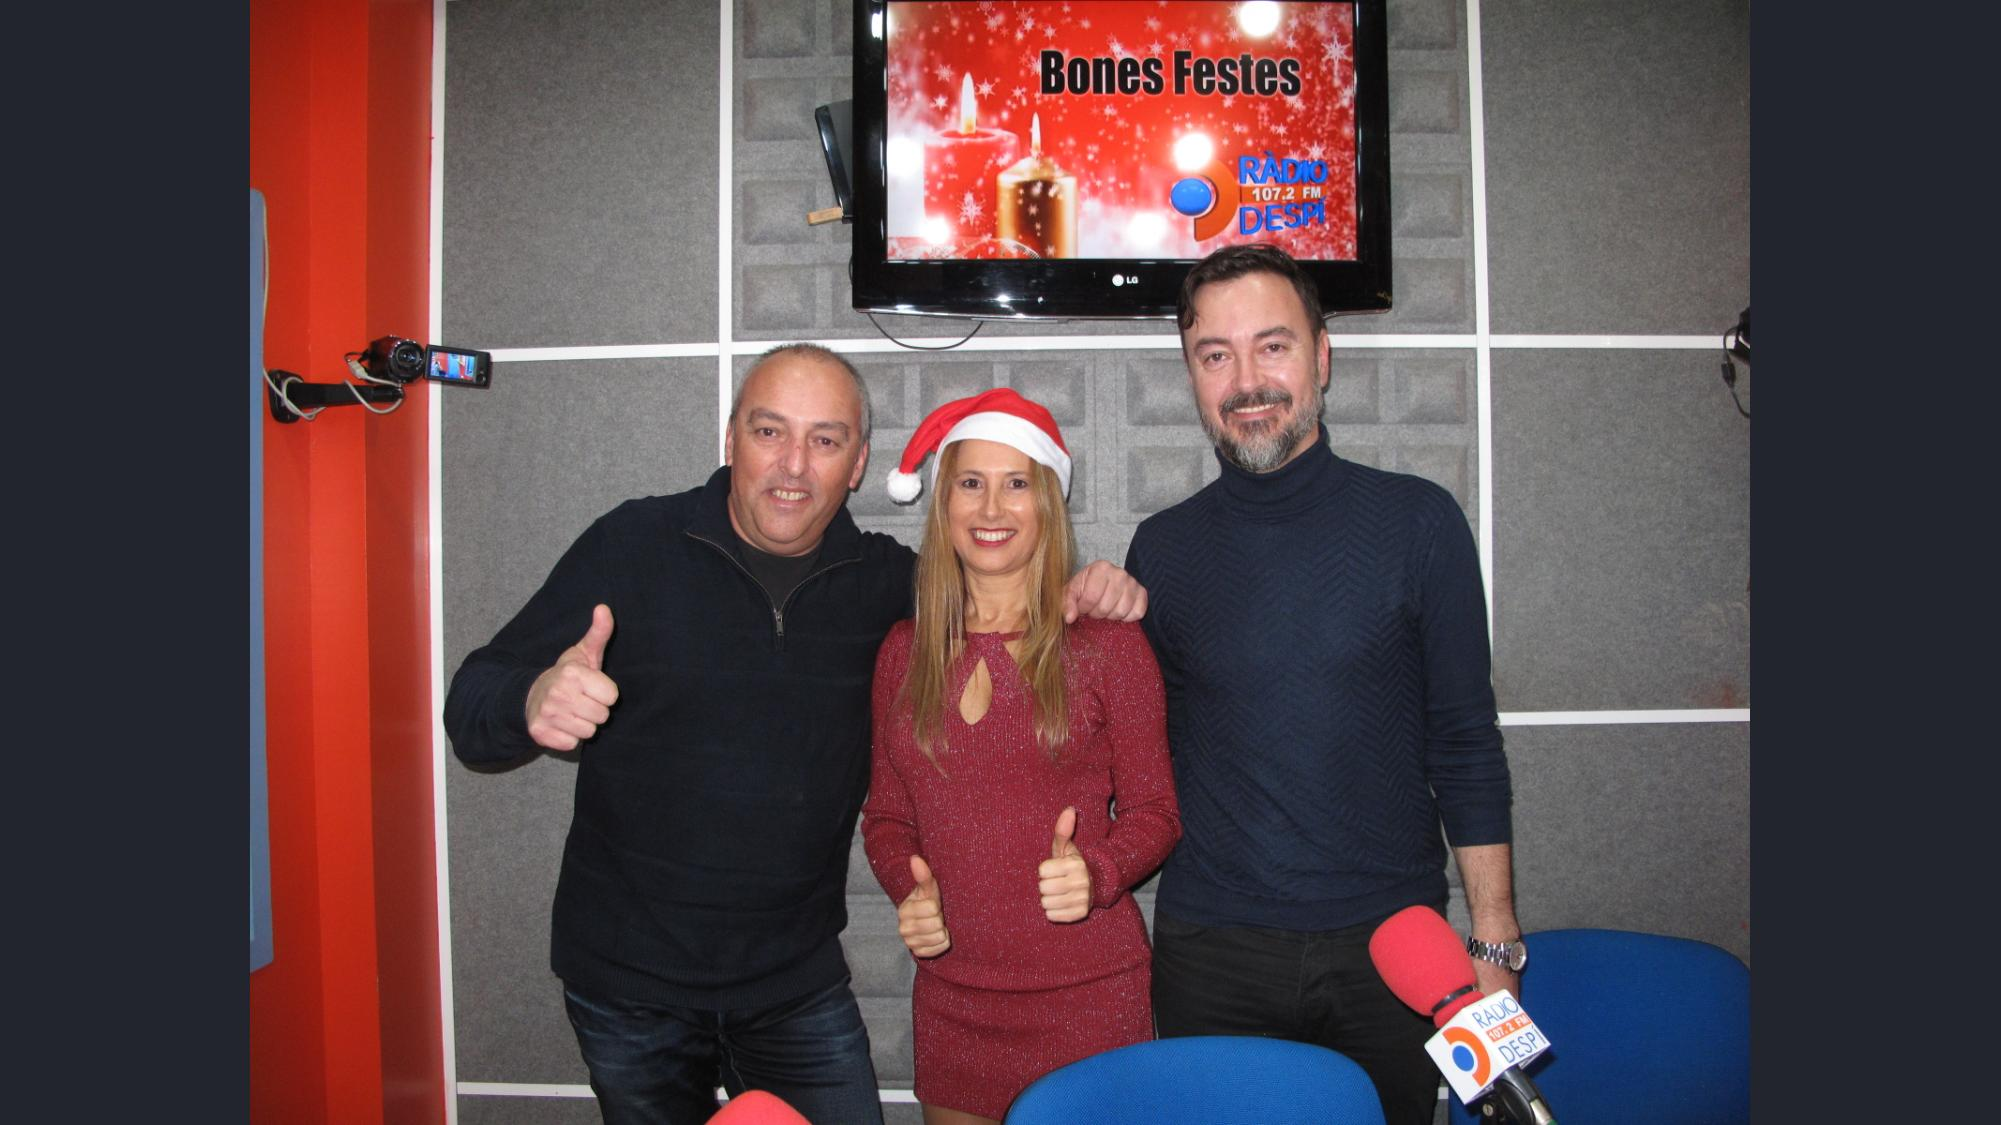 Radio Despi Marato Joguines 2019 Angy Bustamante - Jose Antonio Meca - Xavi Tobaja de Hits Box Topdisco Radio.